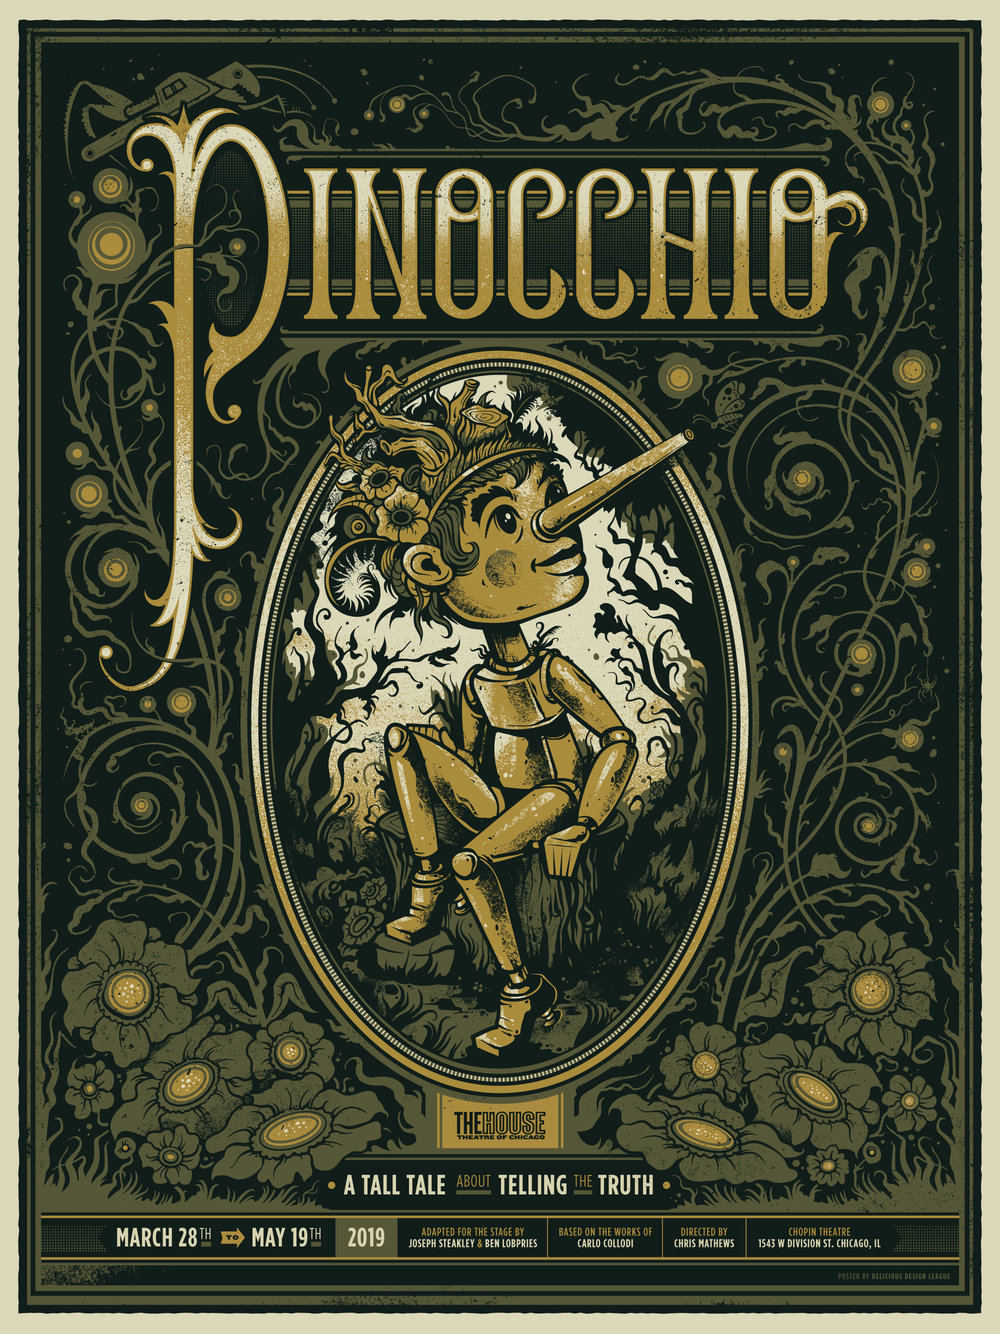 Pinocchio World Premiere Play Musical